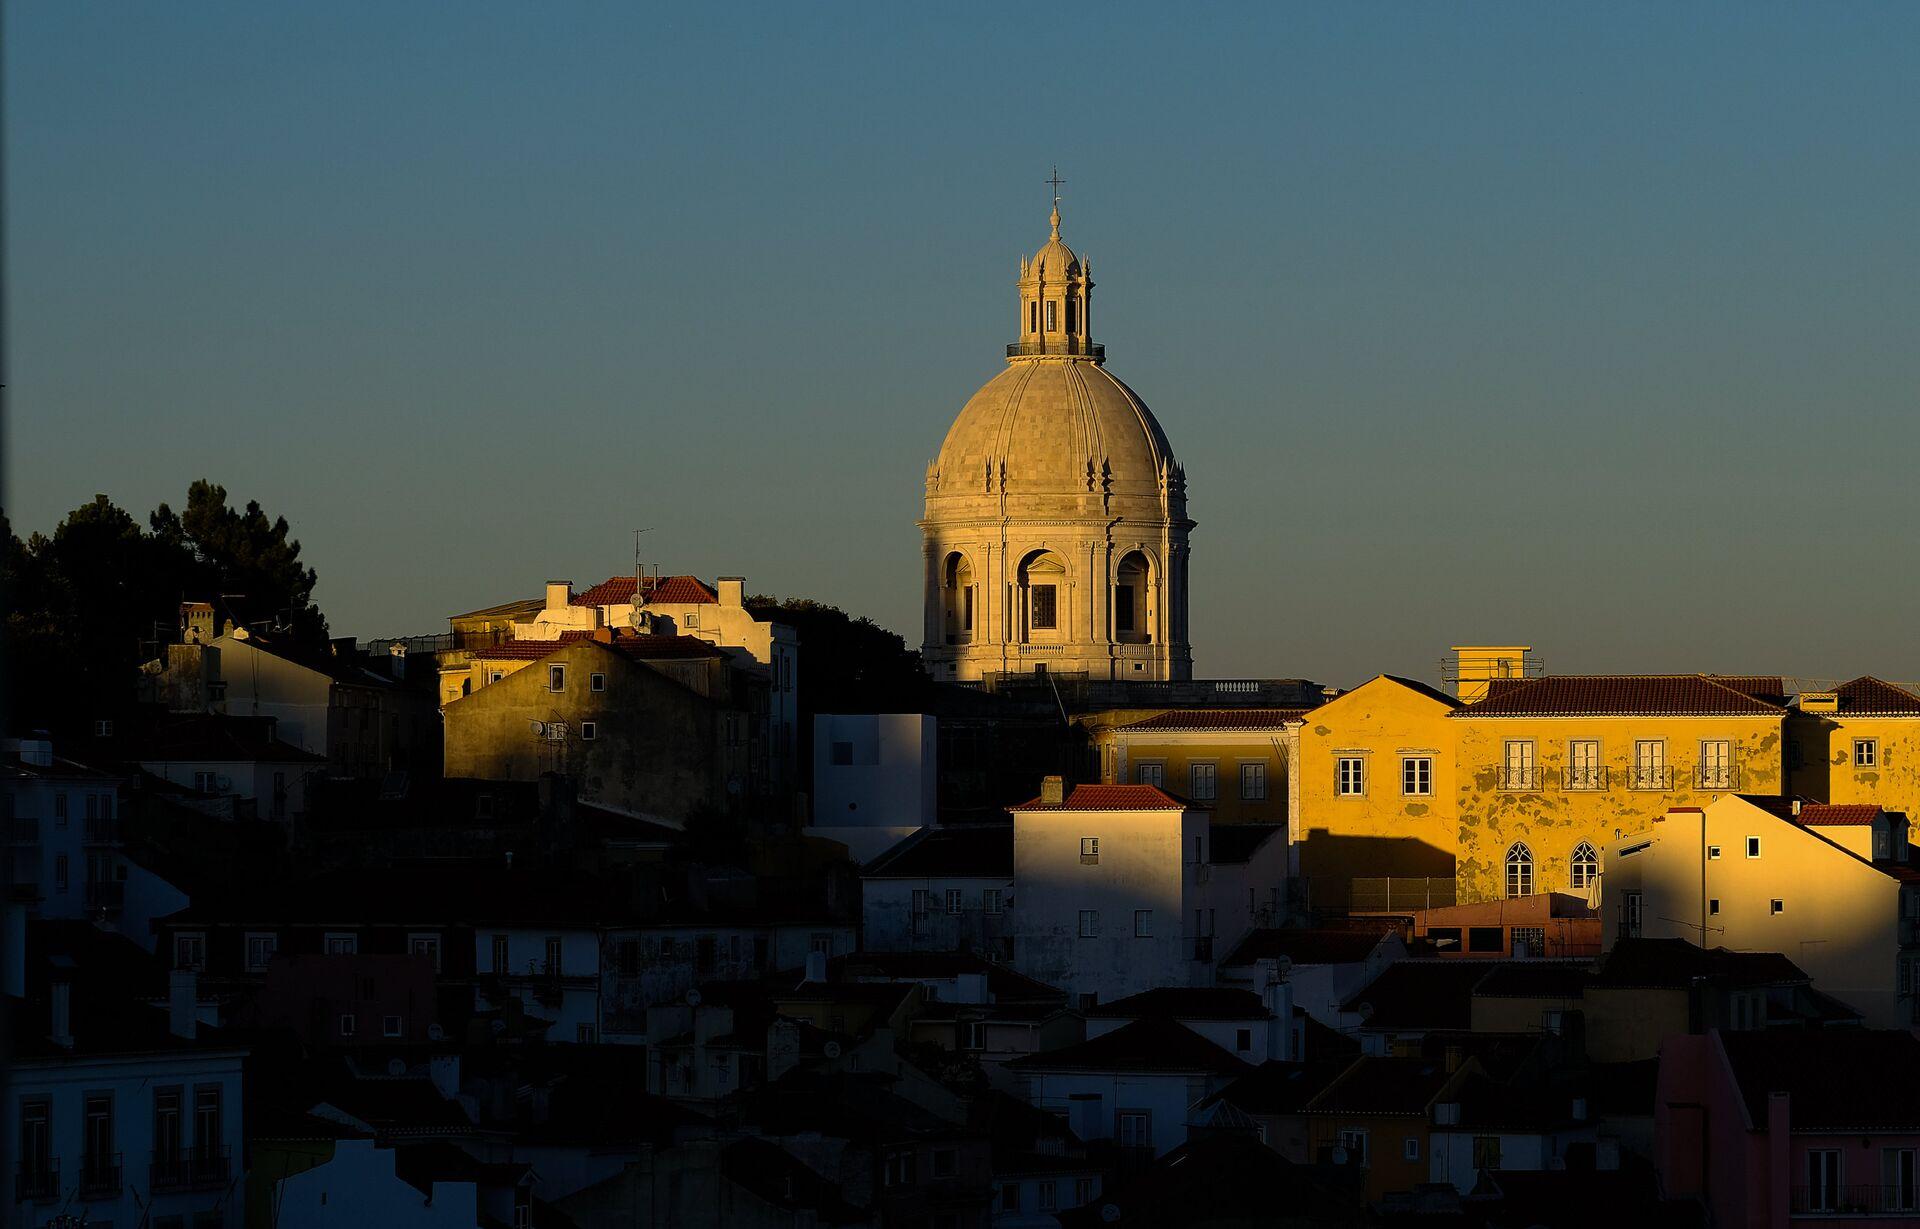 Вид на Лиссабон со смотровой площадки Санта Лючия - РИА Новости, 1920, 15.10.2020